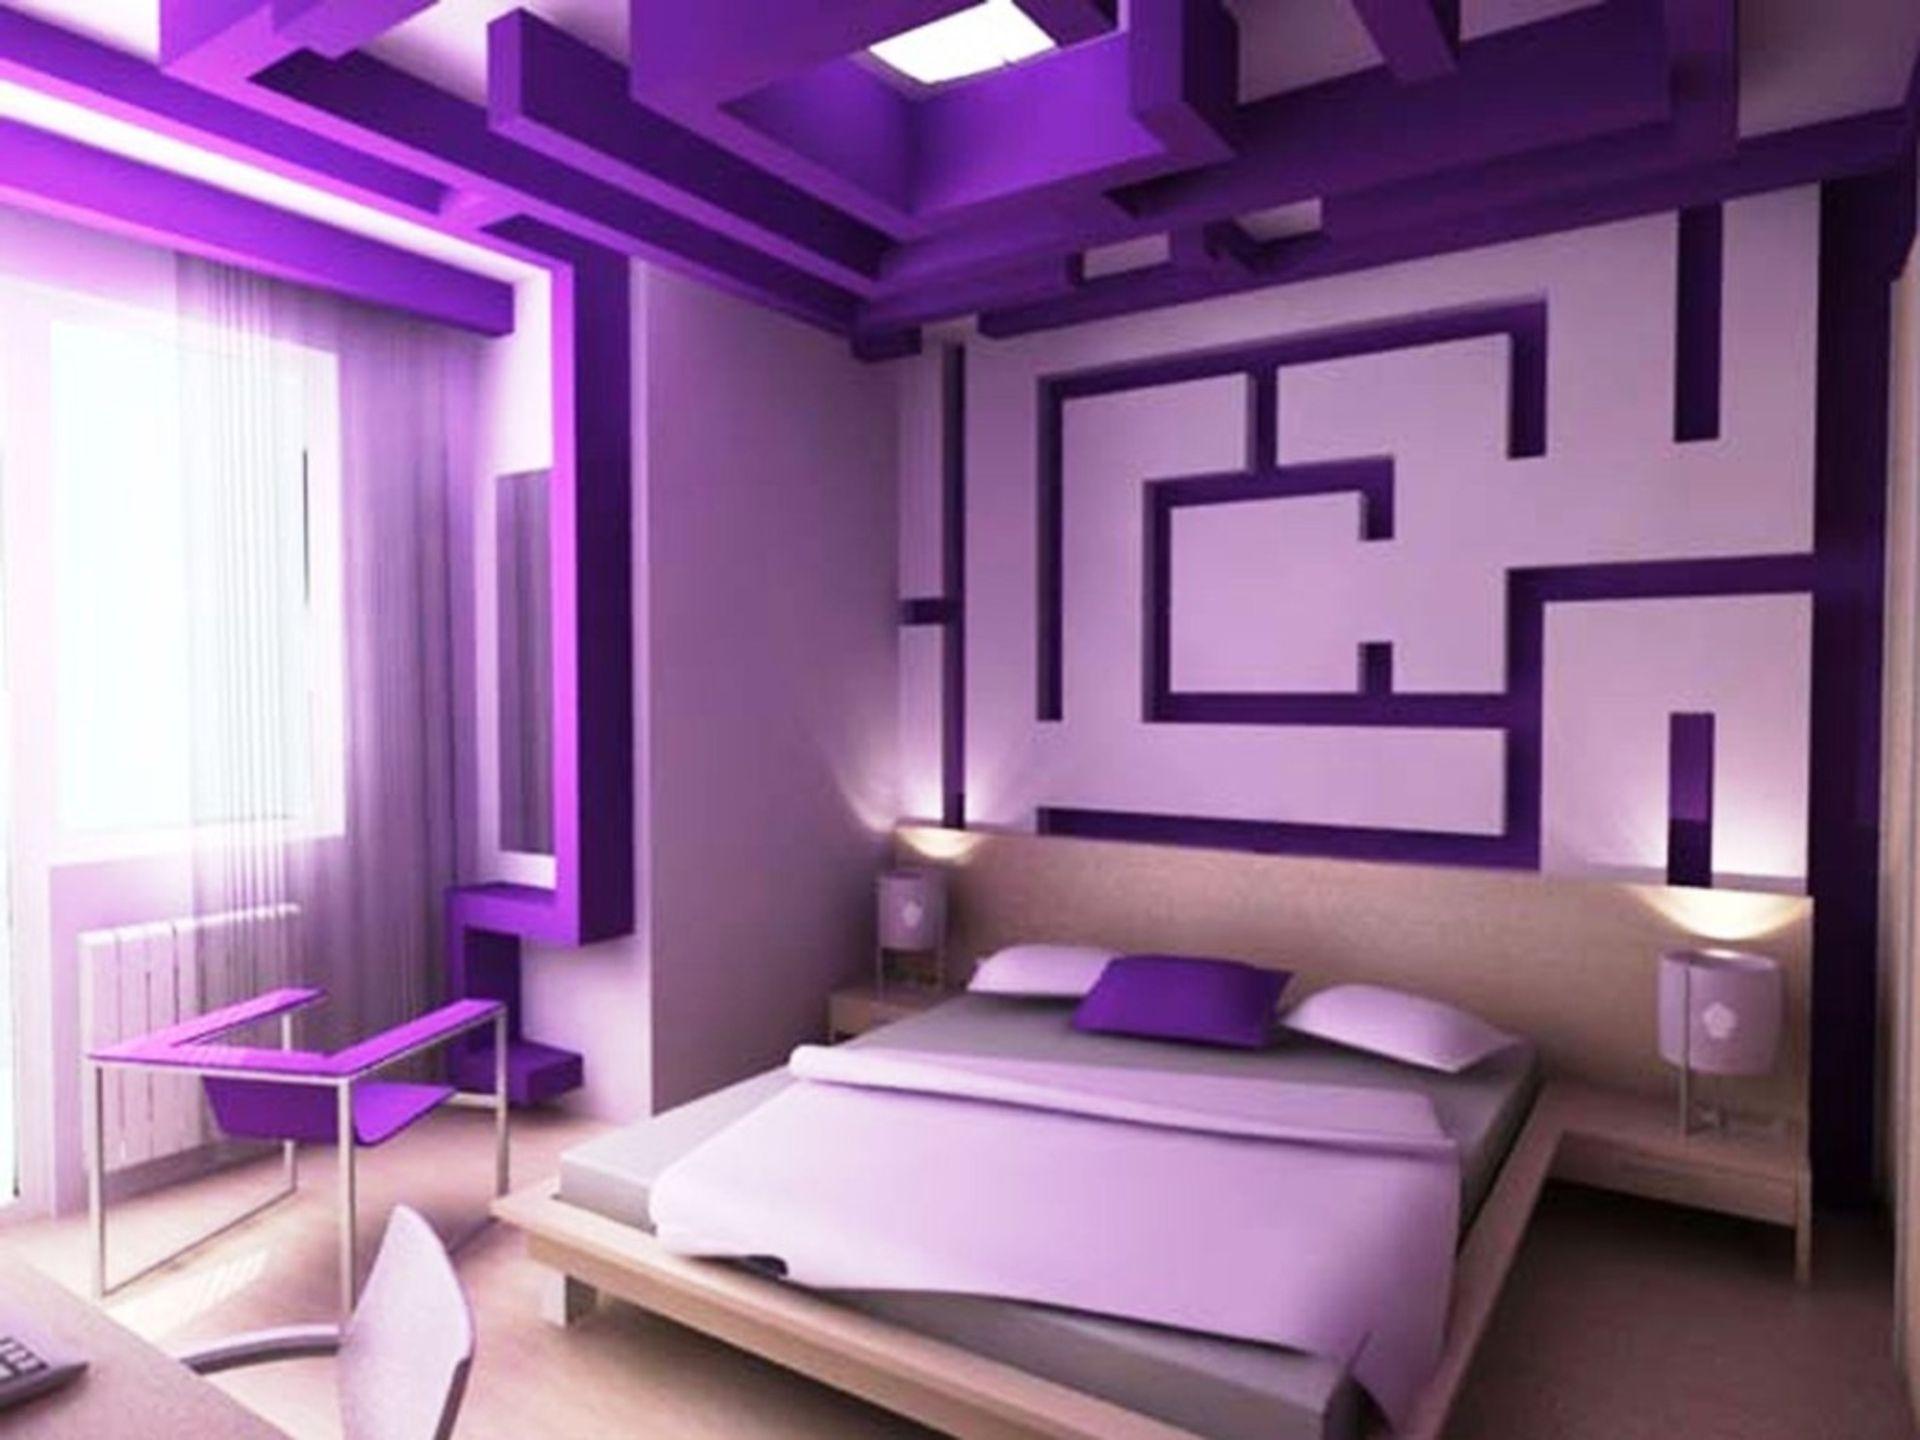 interior design posh purple bedroom ideas with cool master ...